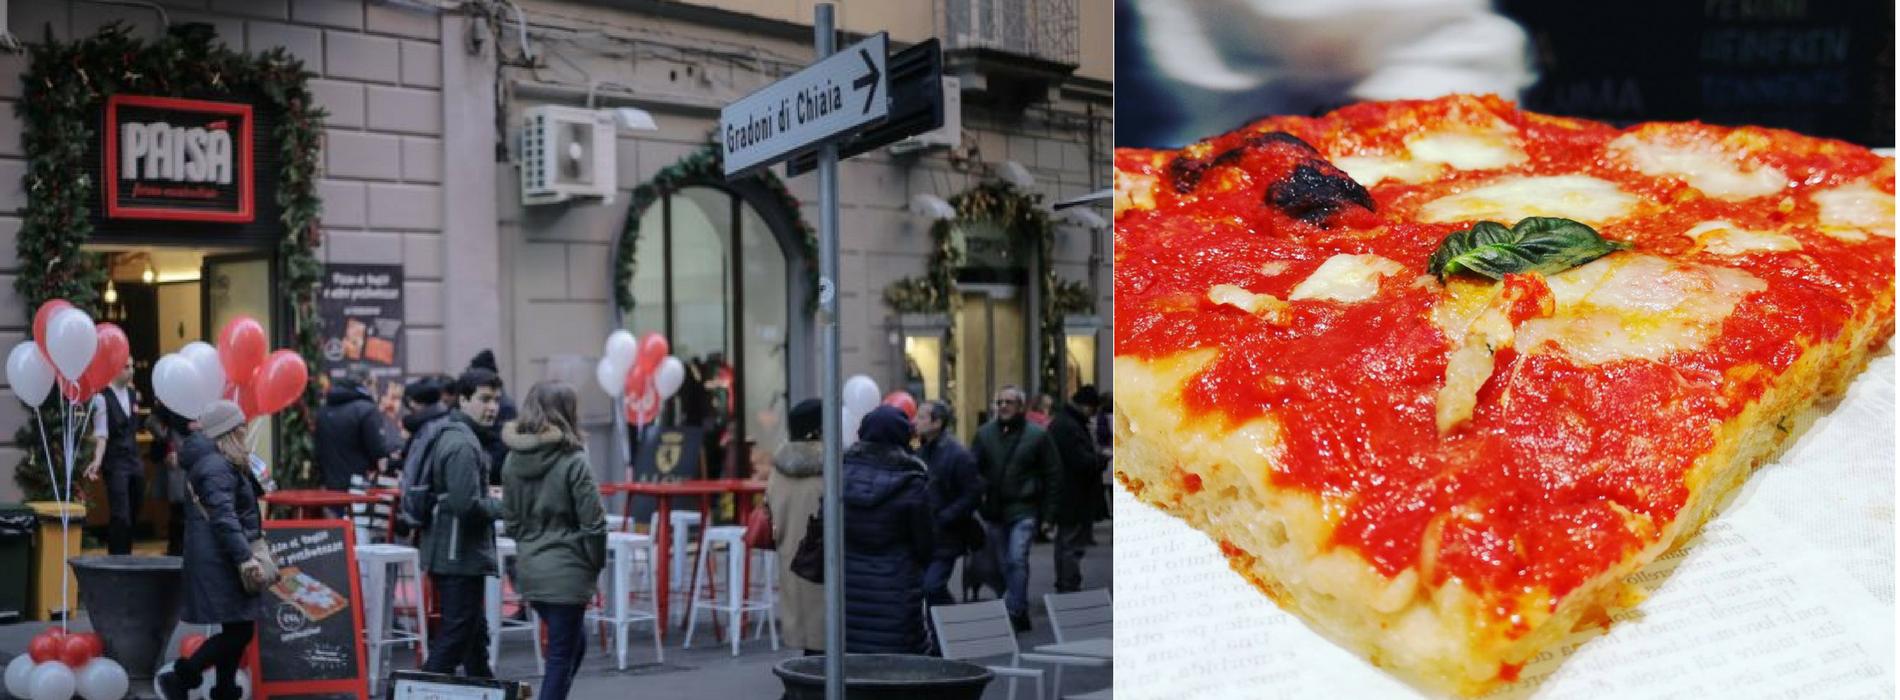 Nasce un nuovo fast food a via Chiaia:Paisà